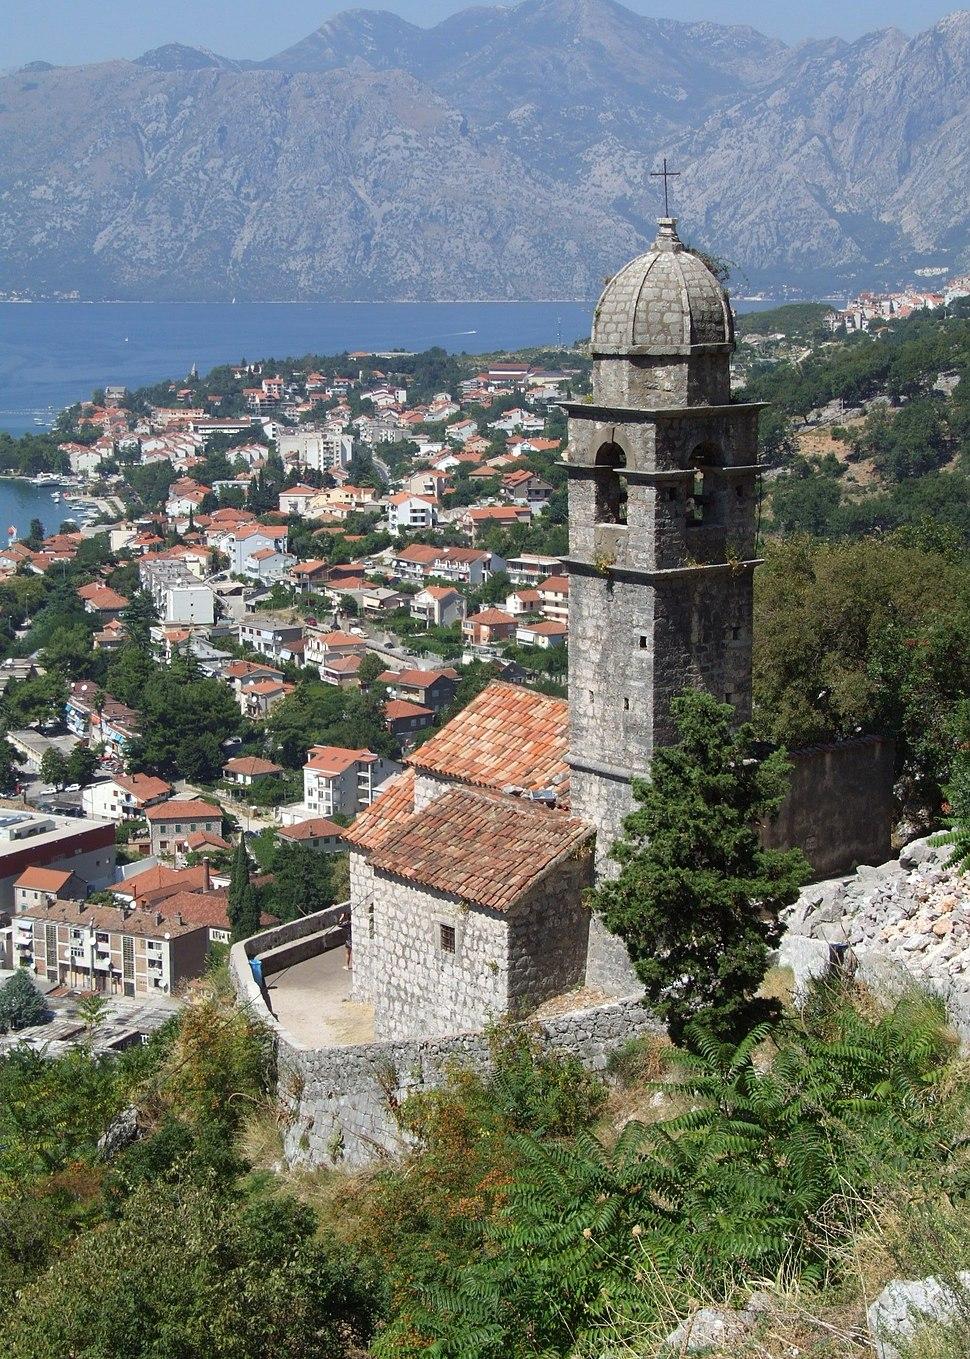 Crkva Gospa od Zdravlja (Kotor)